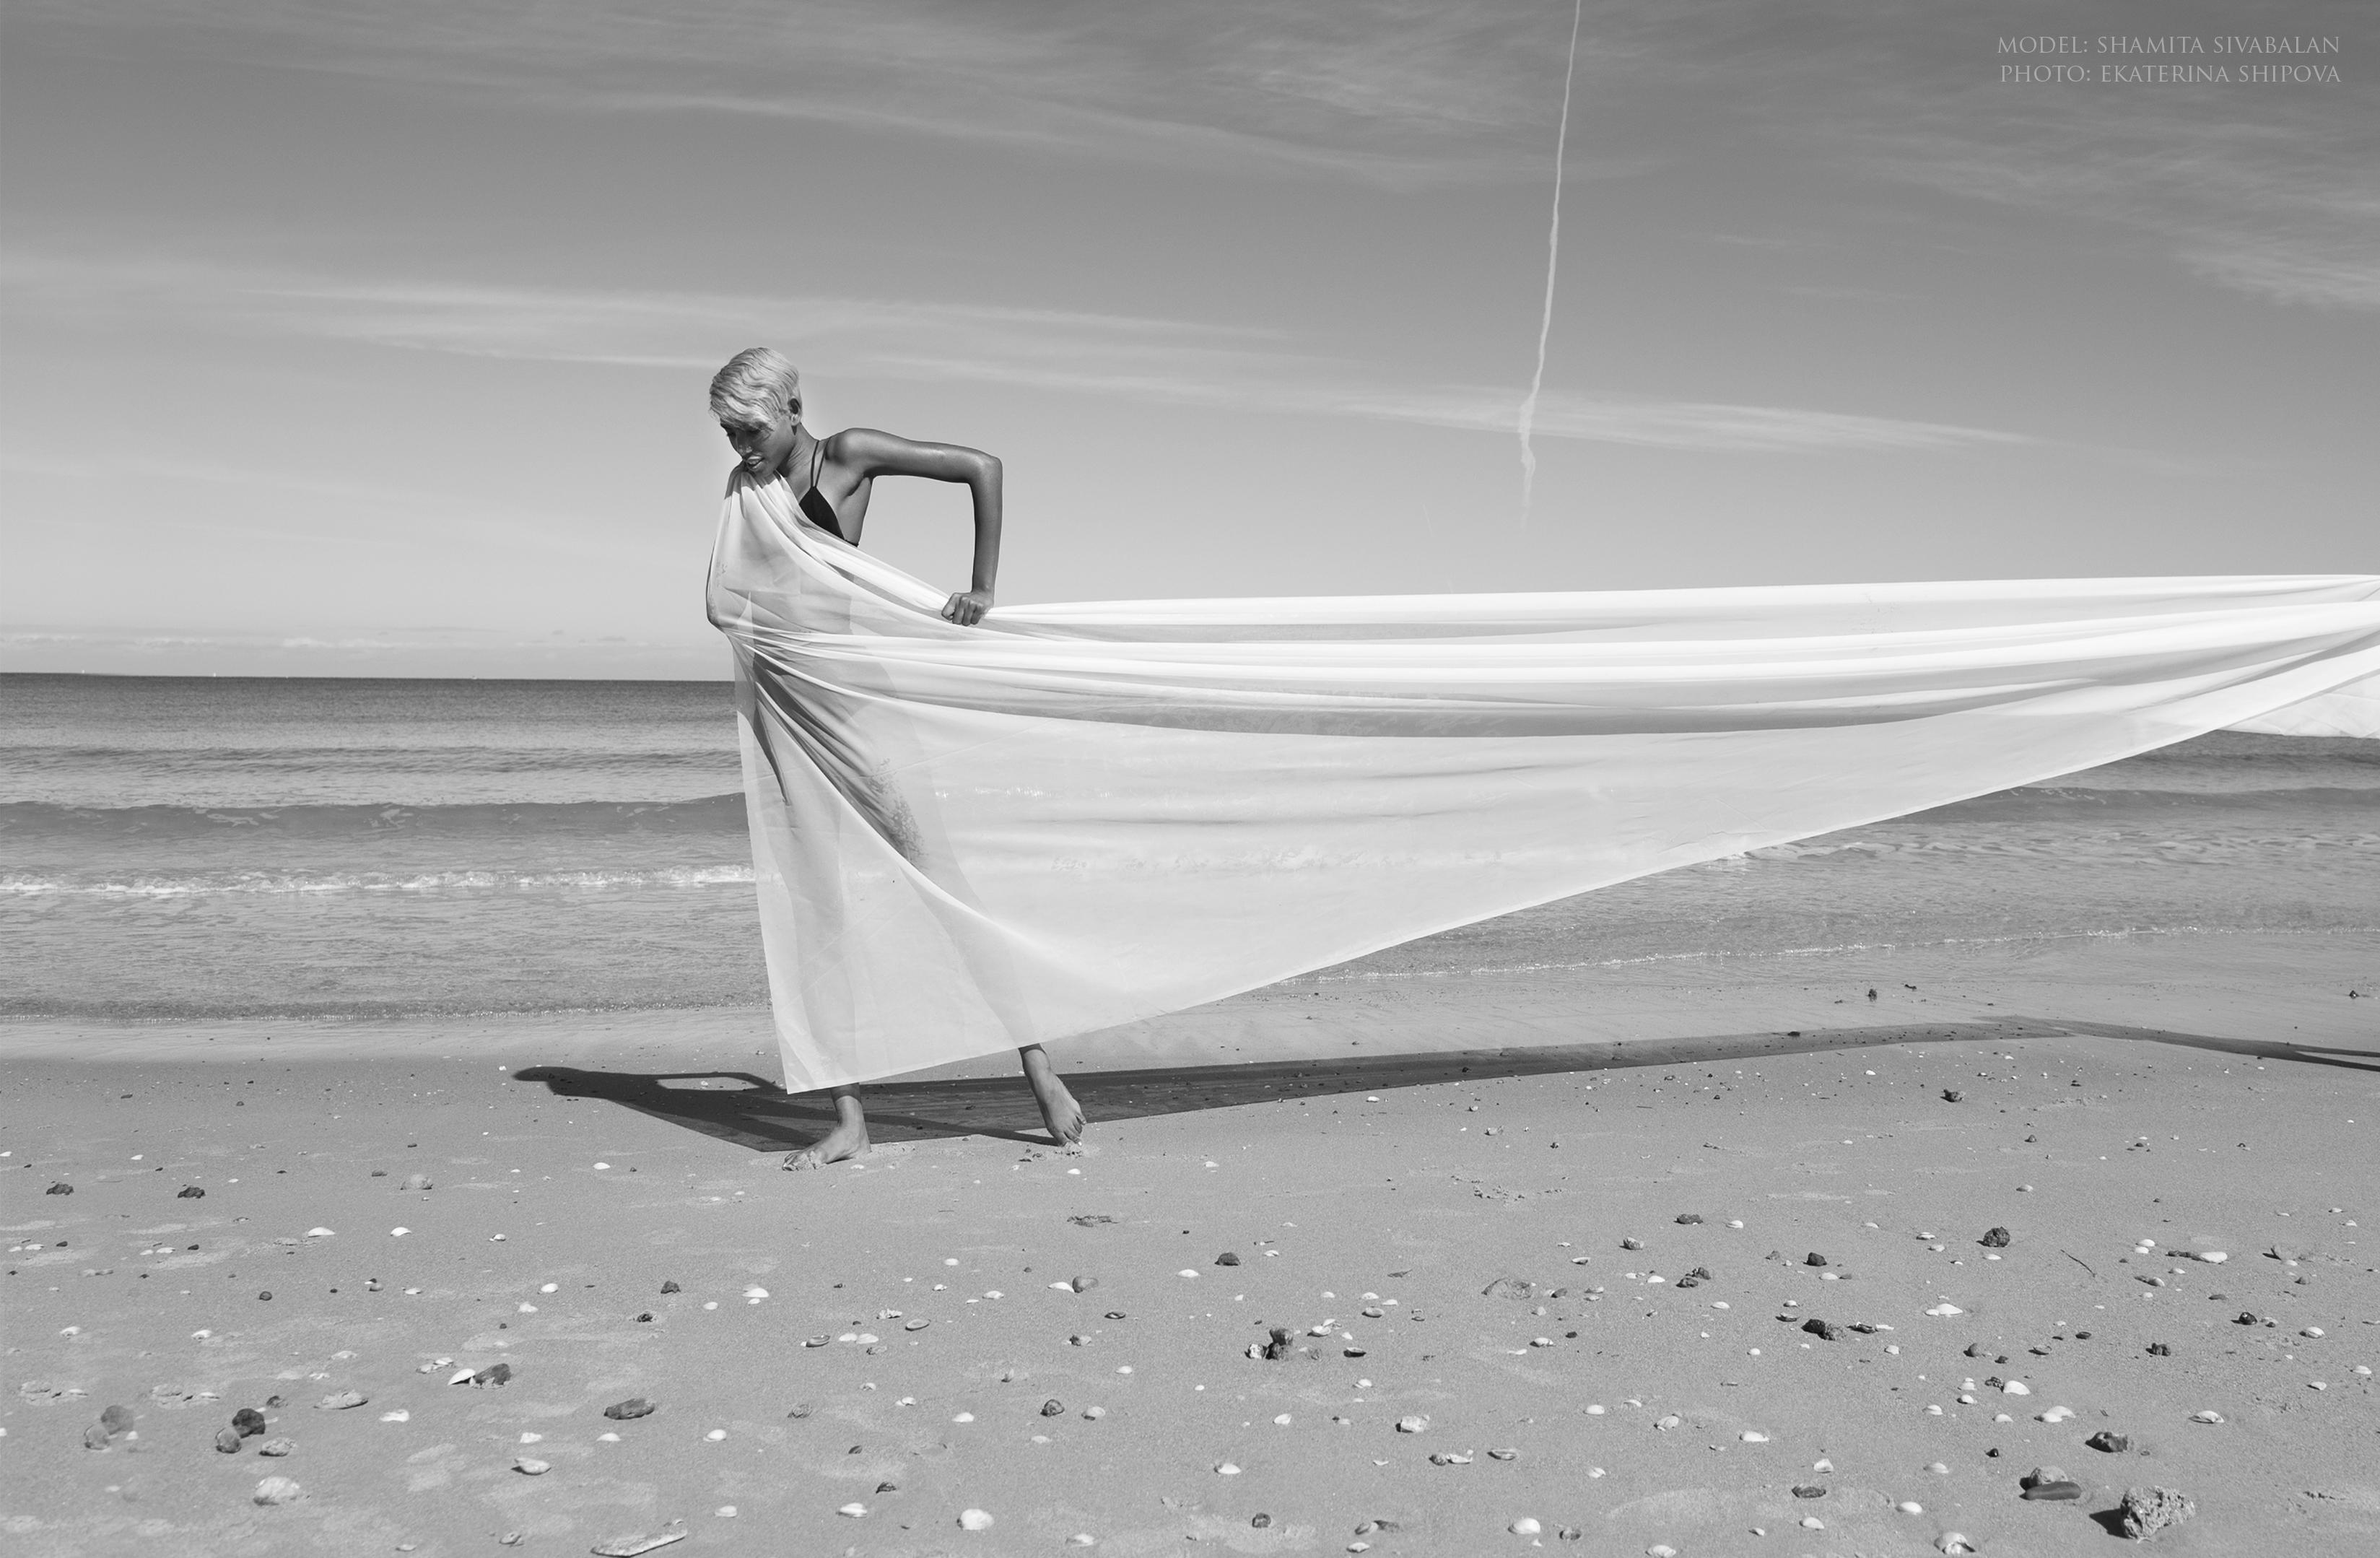 Image by Ekaterina Shipova